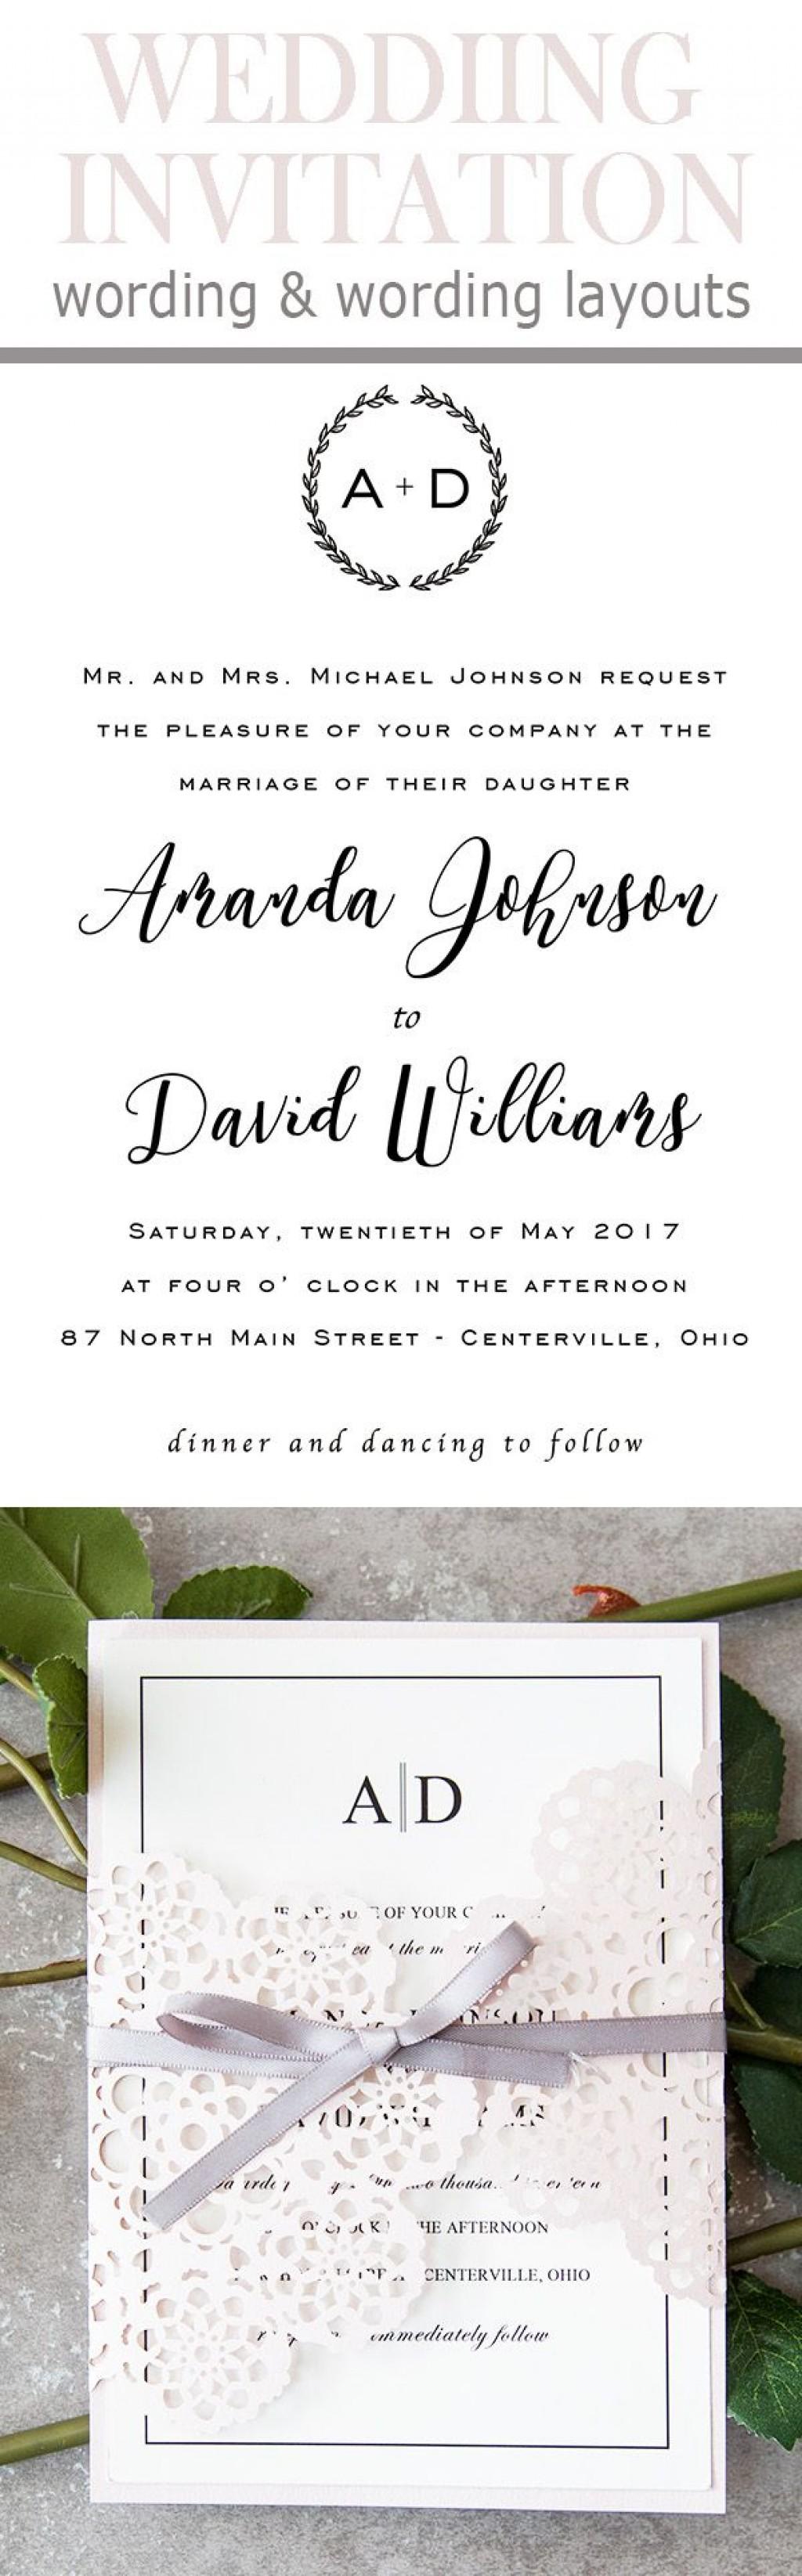 008 Remarkable Formal Wedding Invitation Wording Template Inspiration  TemplatesLarge